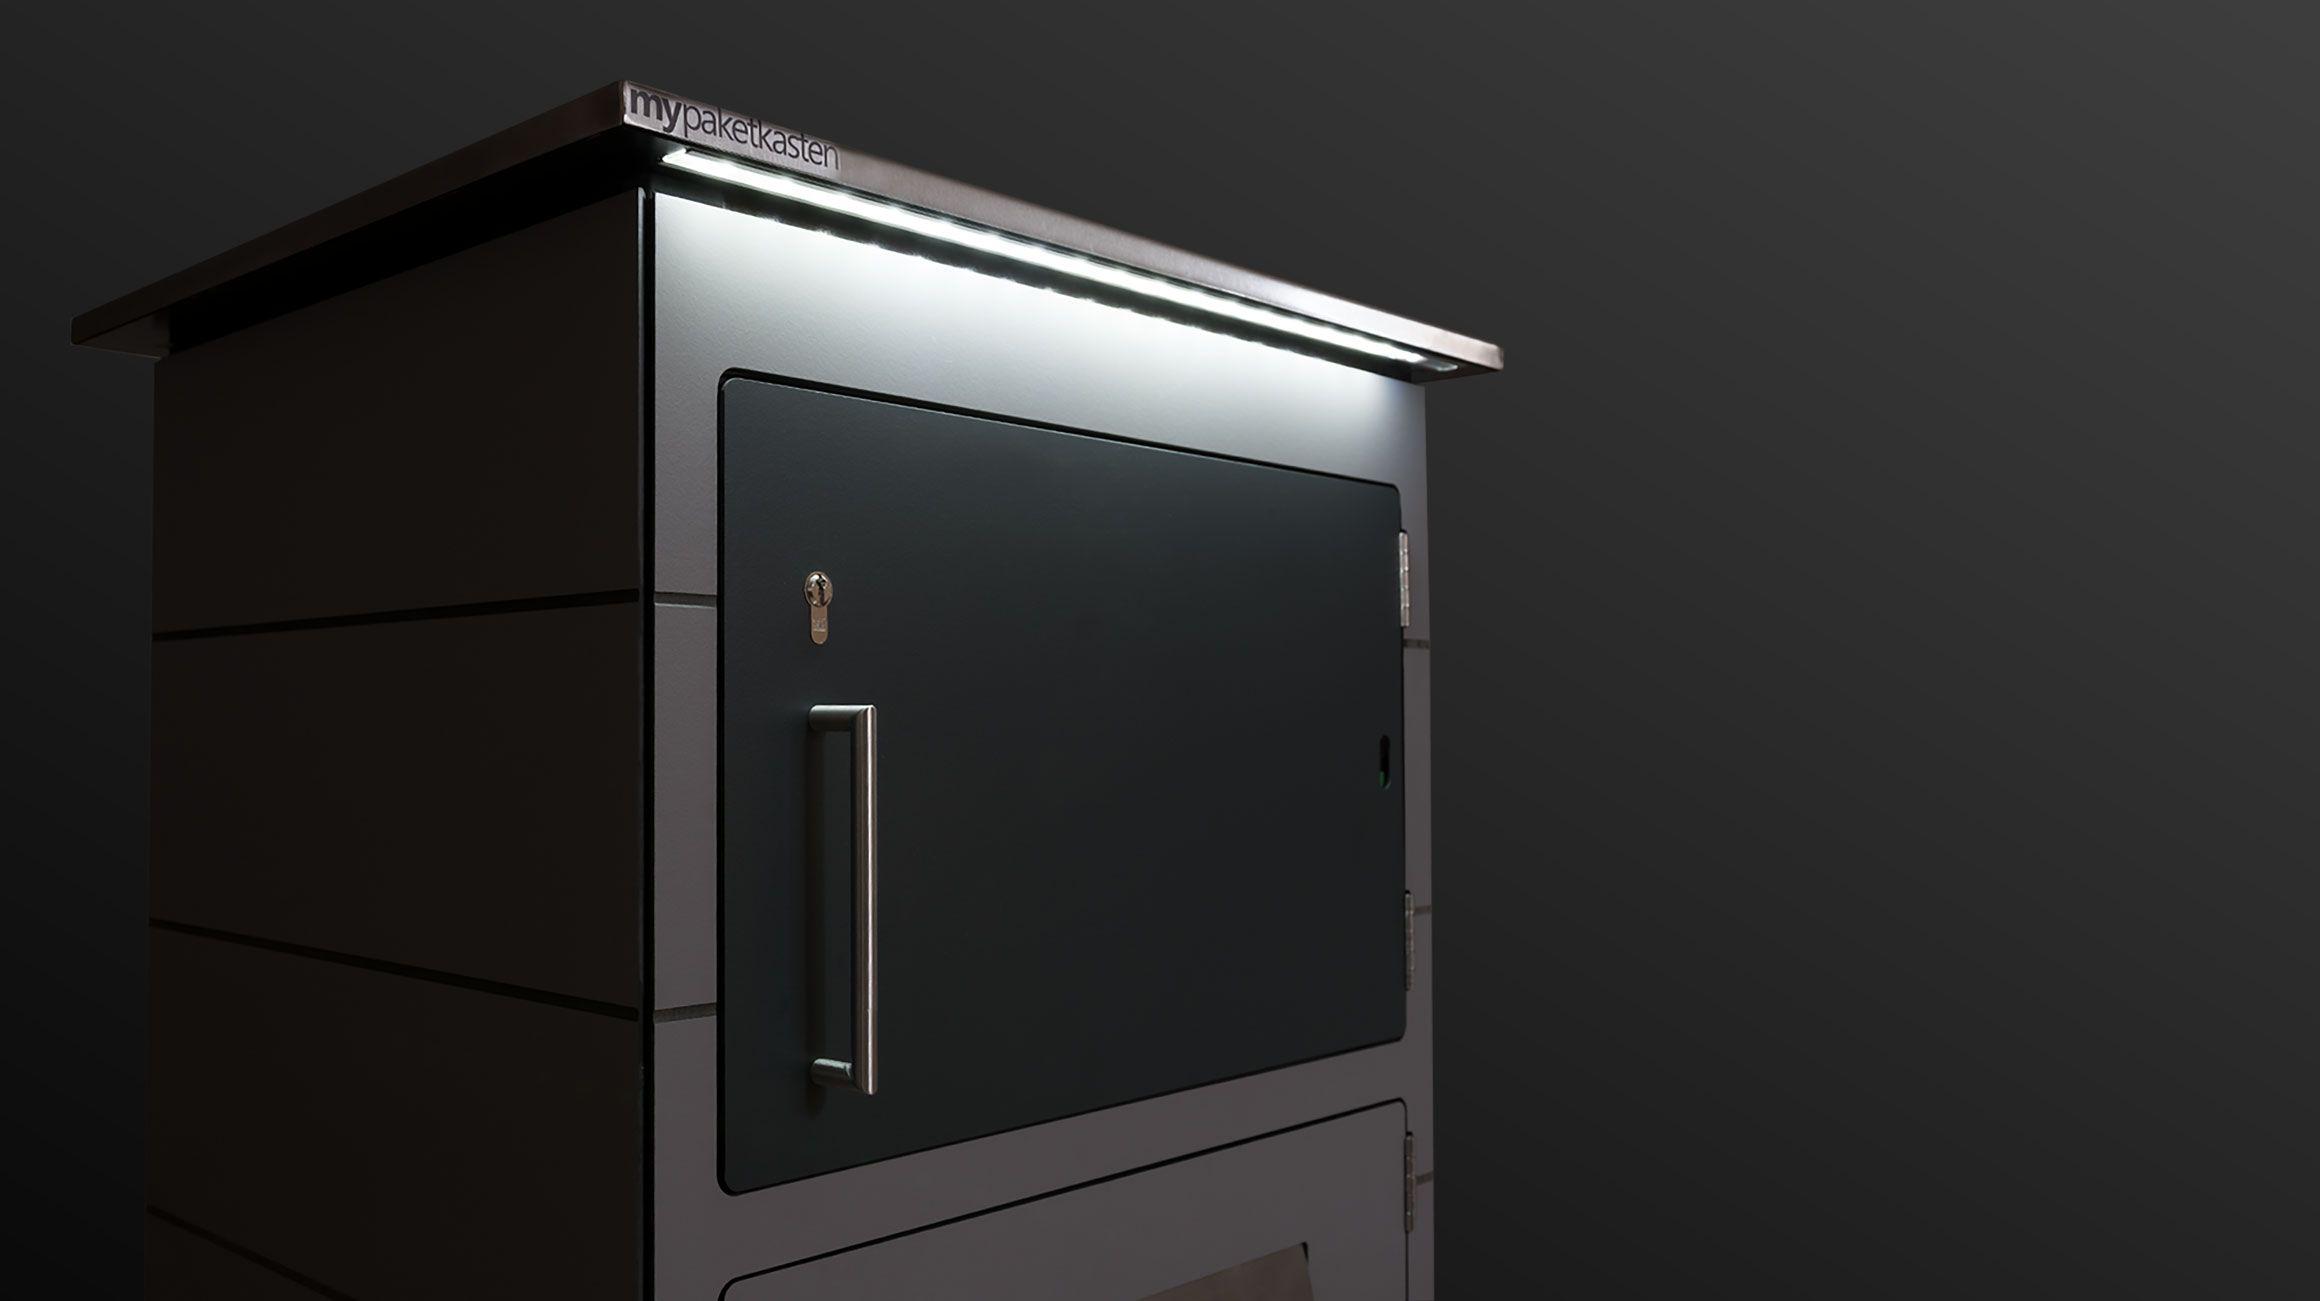 beleuchteter briefkasten f r pakete alle paketkasten modelle pinterest. Black Bedroom Furniture Sets. Home Design Ideas